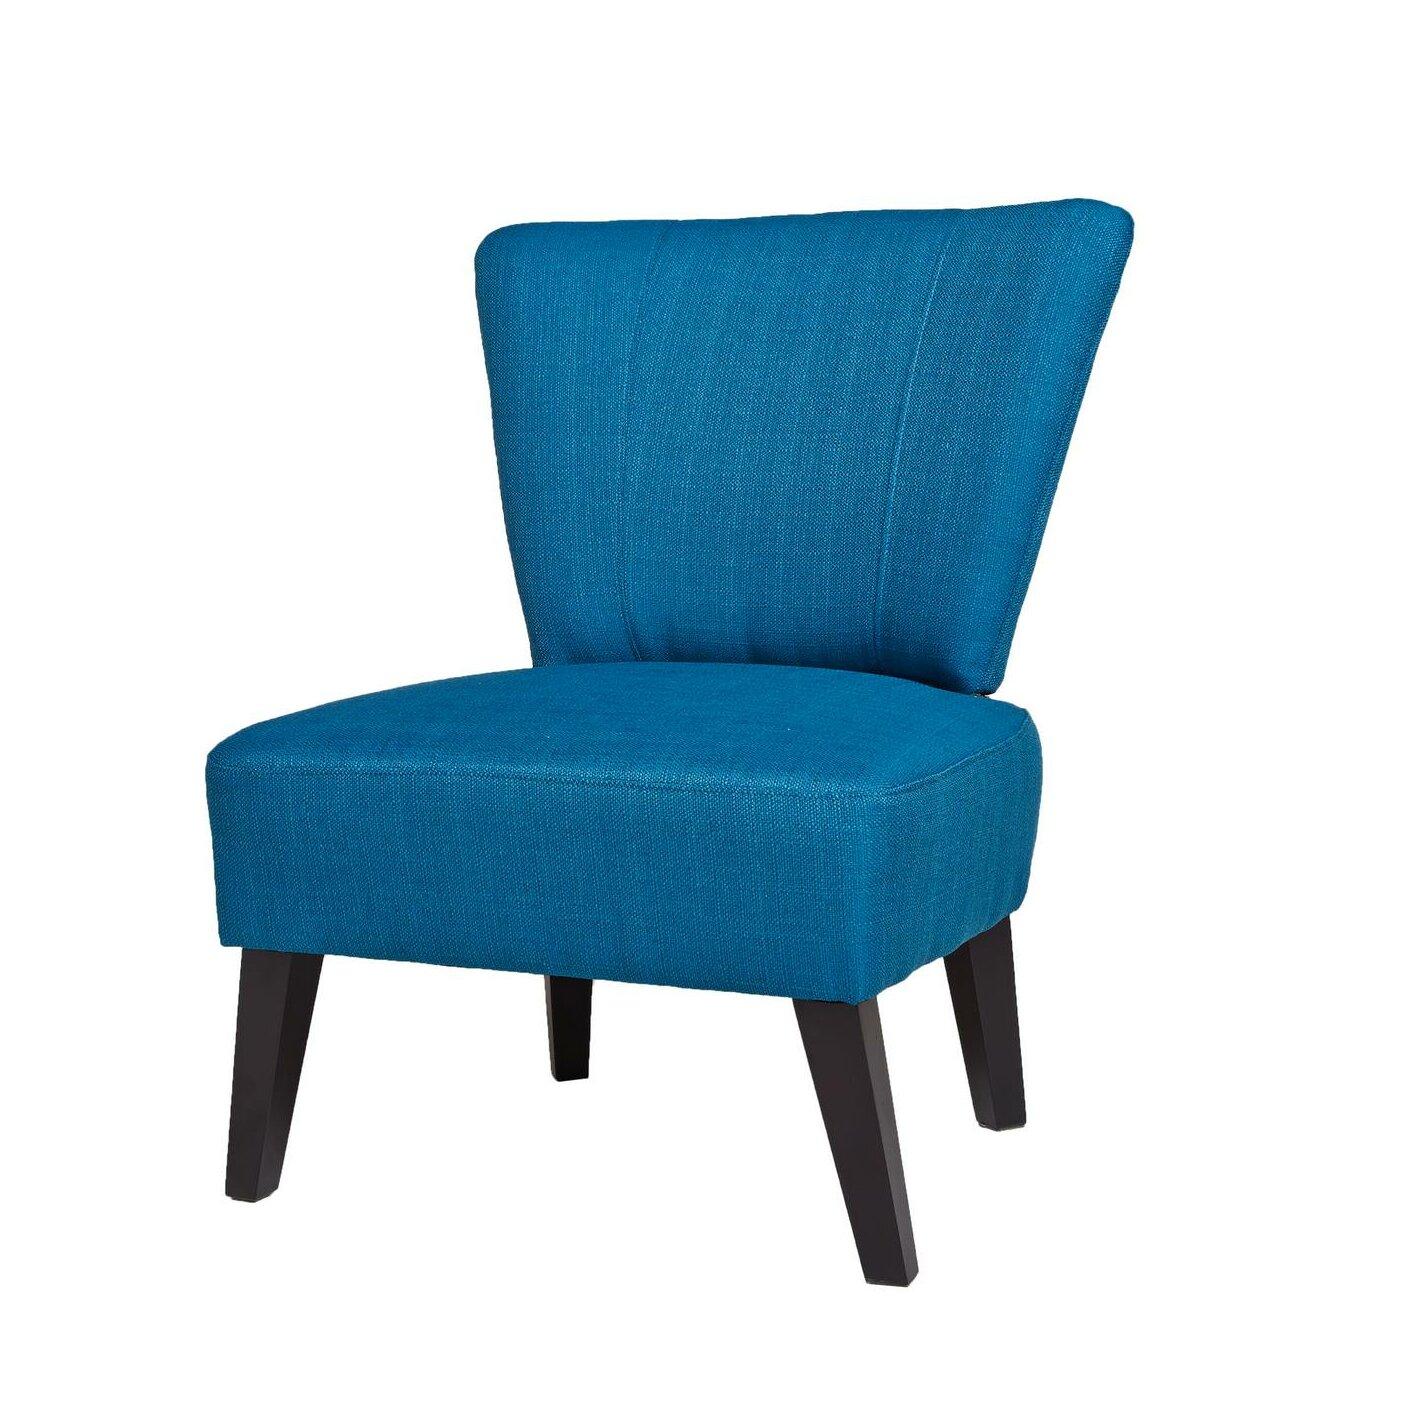 Kaleidoscopefurniture malaga slipper chair reviews - Furniture malaga ...